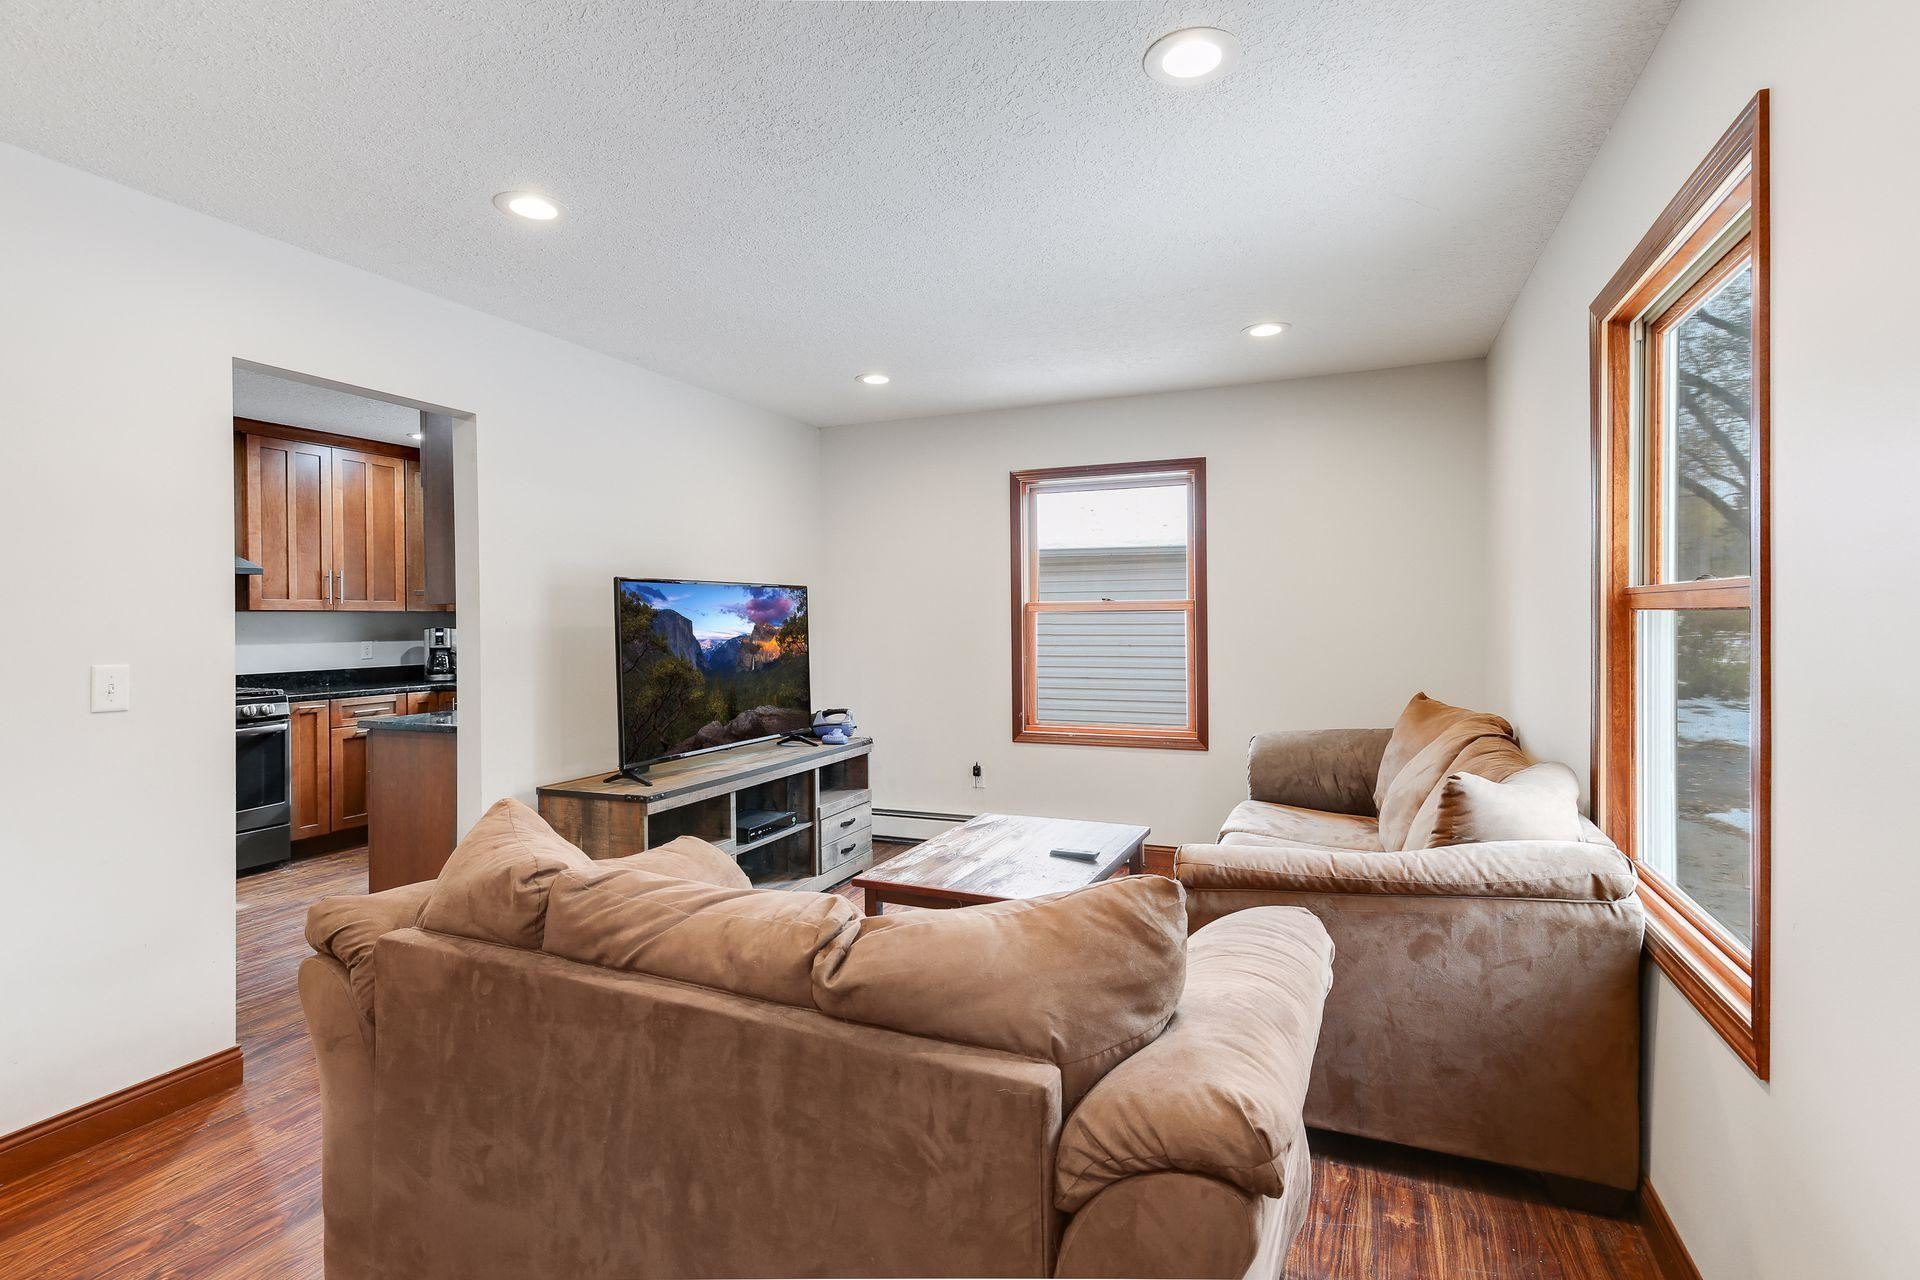 Photo of 10013 1st Avenue S, Bloomington, MN 55420 (MLS # 5651163)